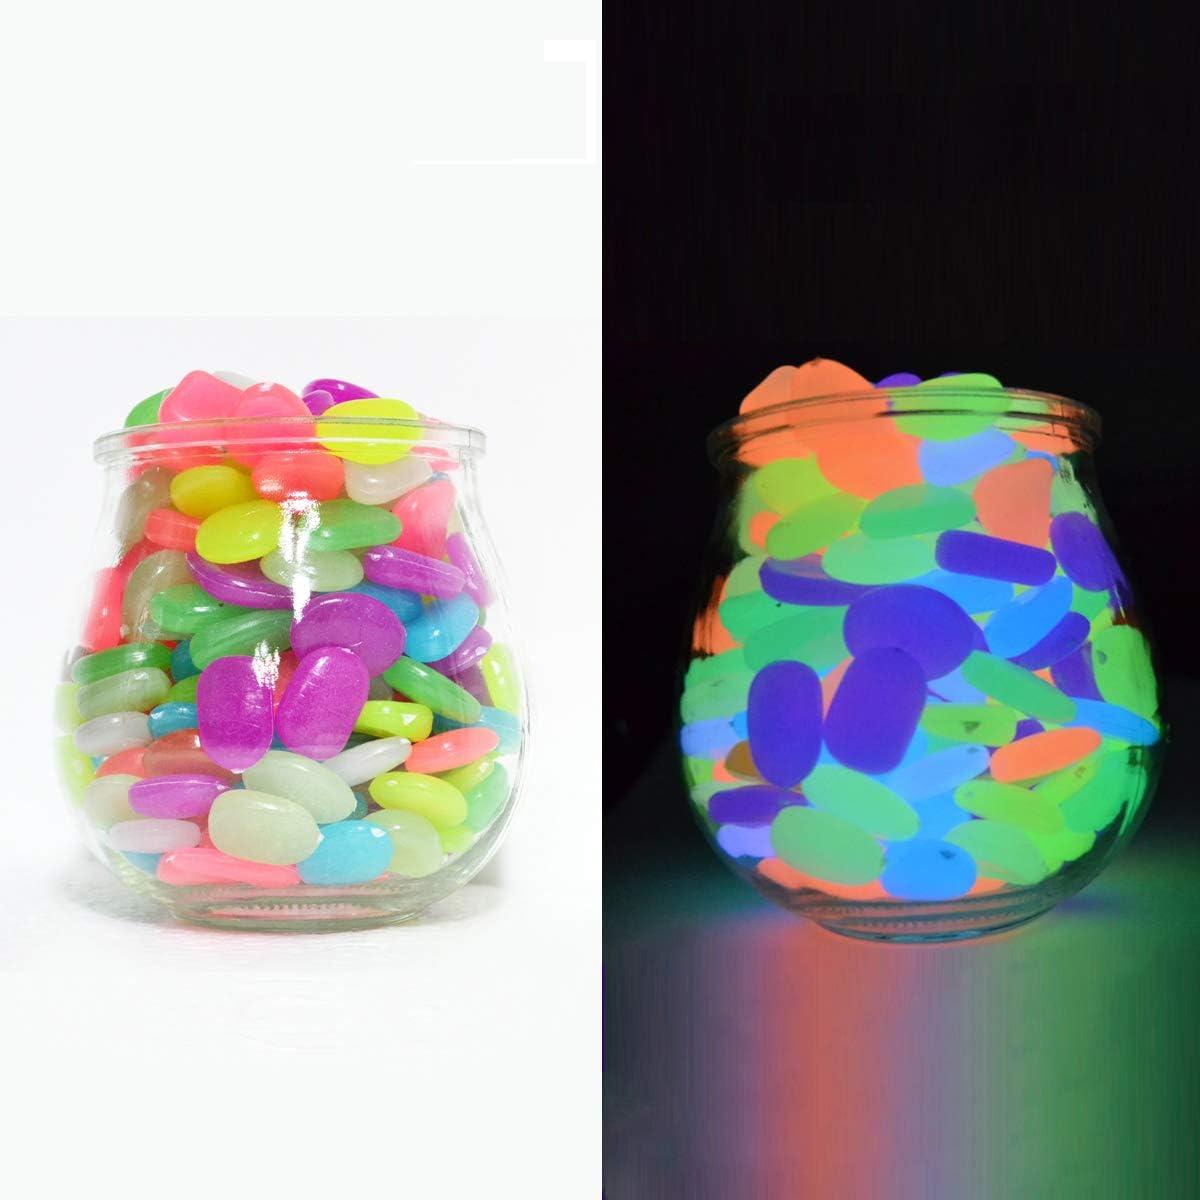 VKEDA Glow in The Dark Pebbles 200 Pcs, Stones for Garden/Landscaping/Fish Tank/Plant Pots/Yard Plant Decorations